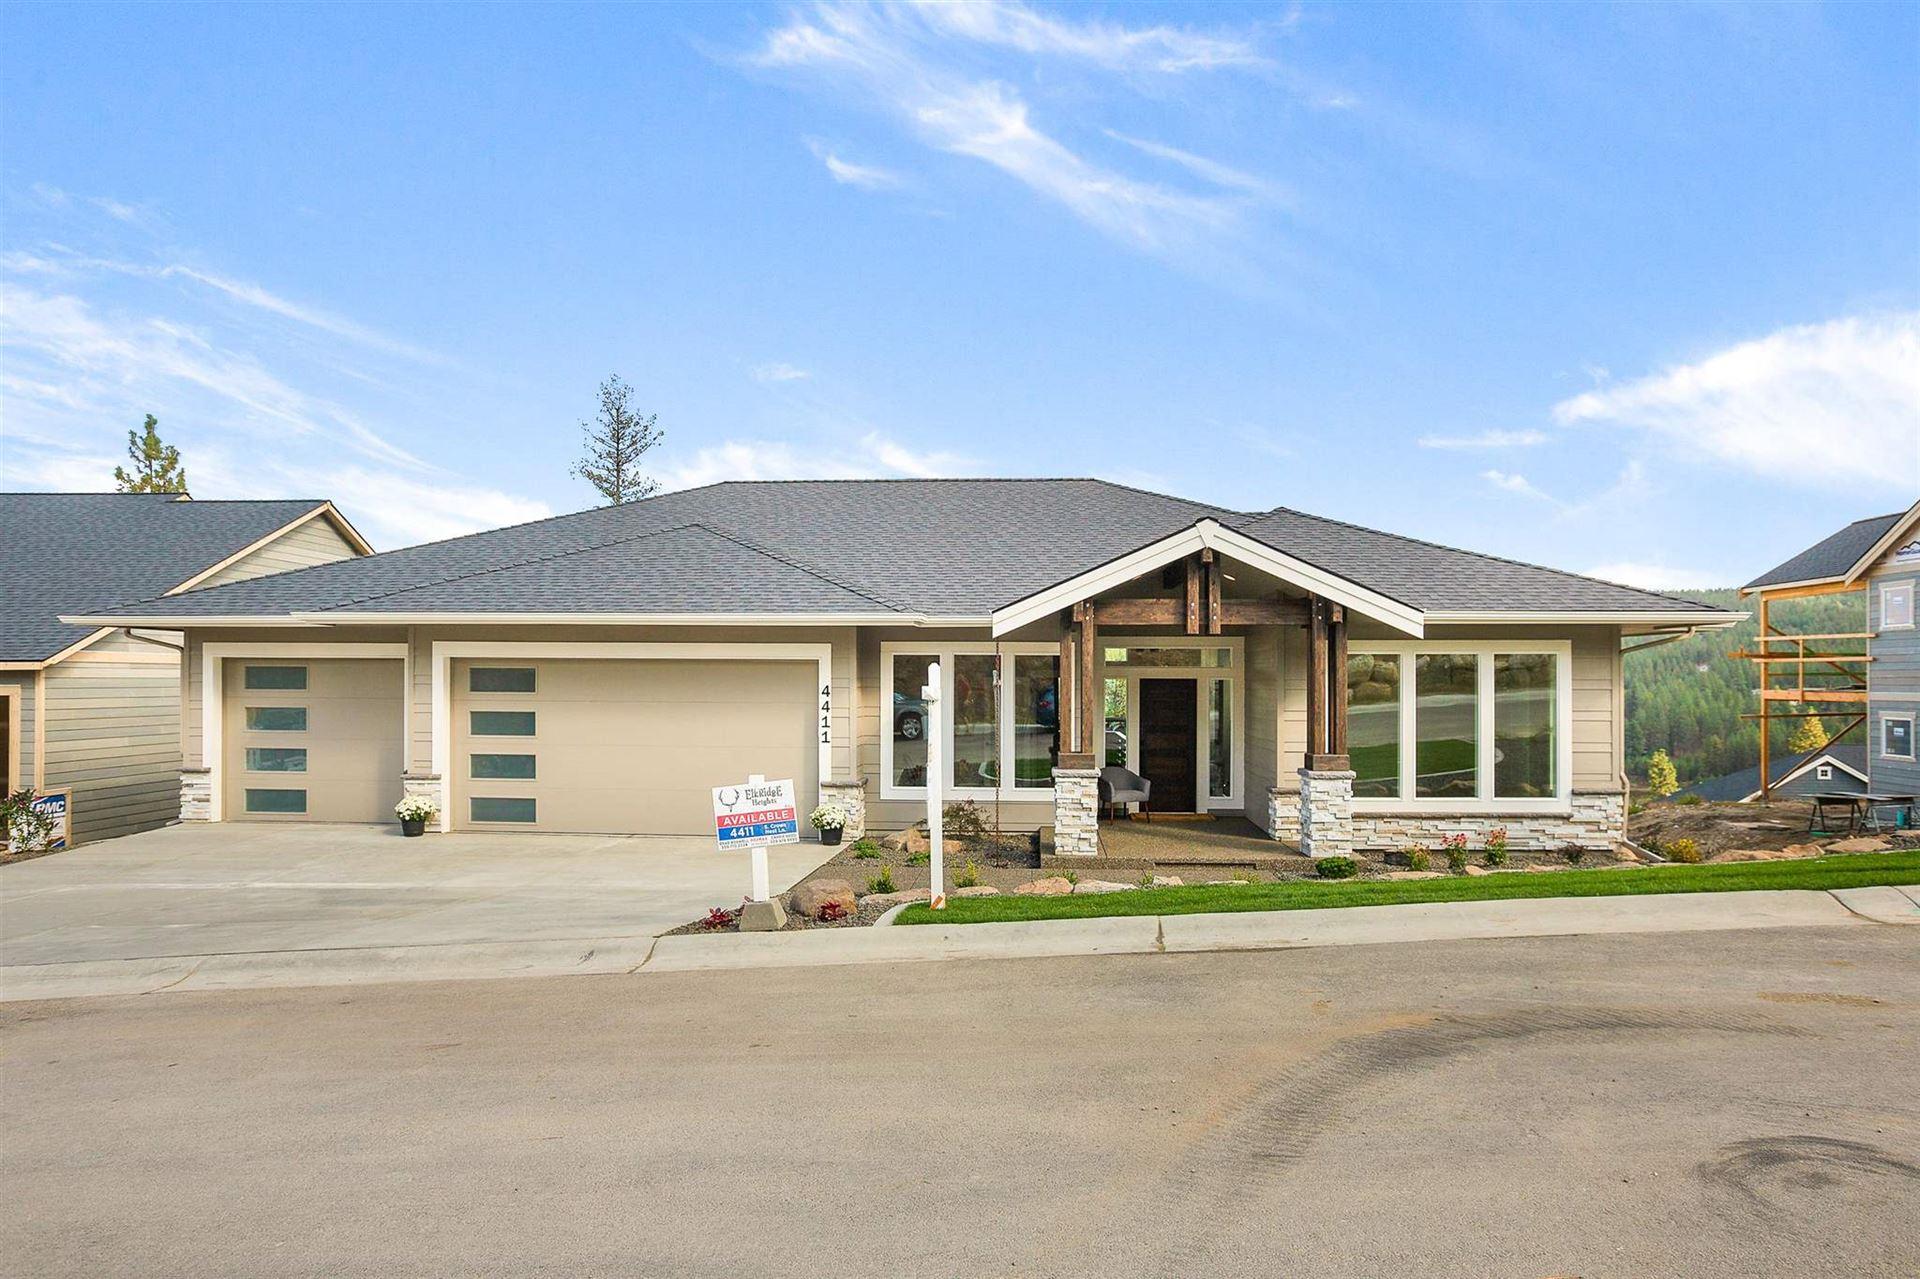 4411 S Crows Nest Ln, Spokane Valley, WA 99206 - #: 202117033